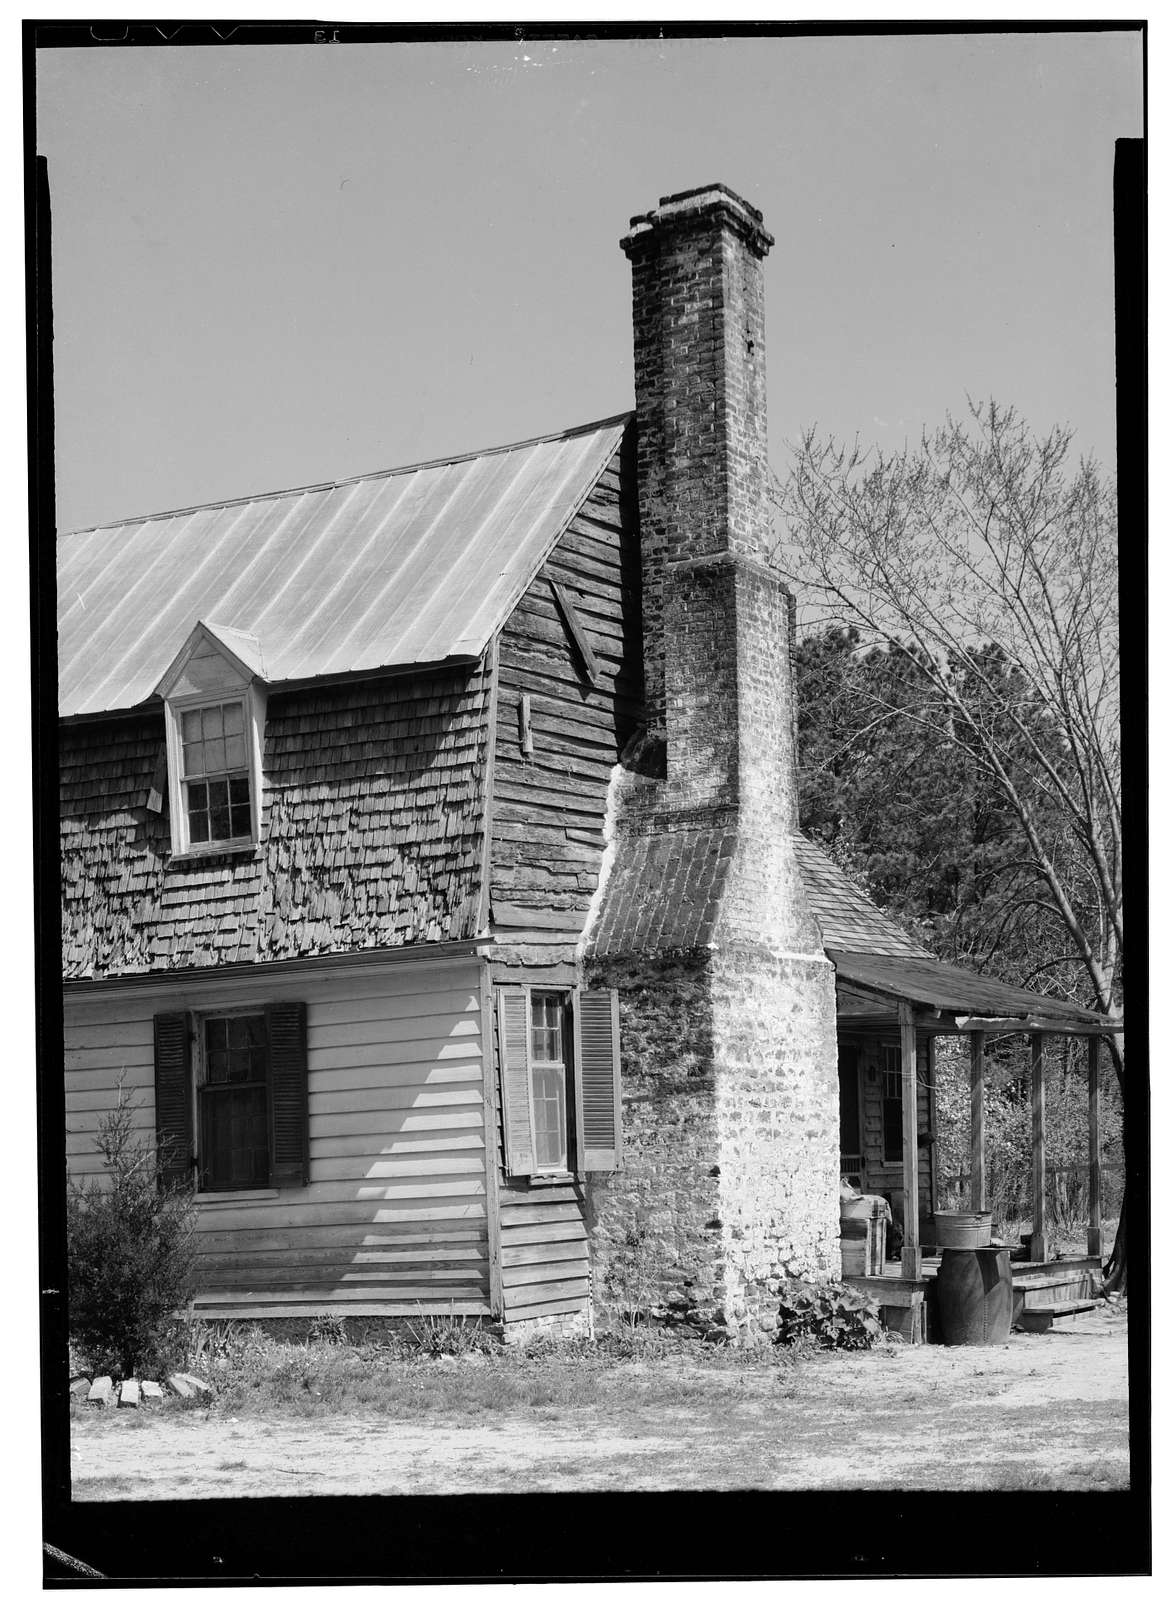 Poplar Hall, Skiff's Creek vicinity, Williamsburg, Williamsburg, VA